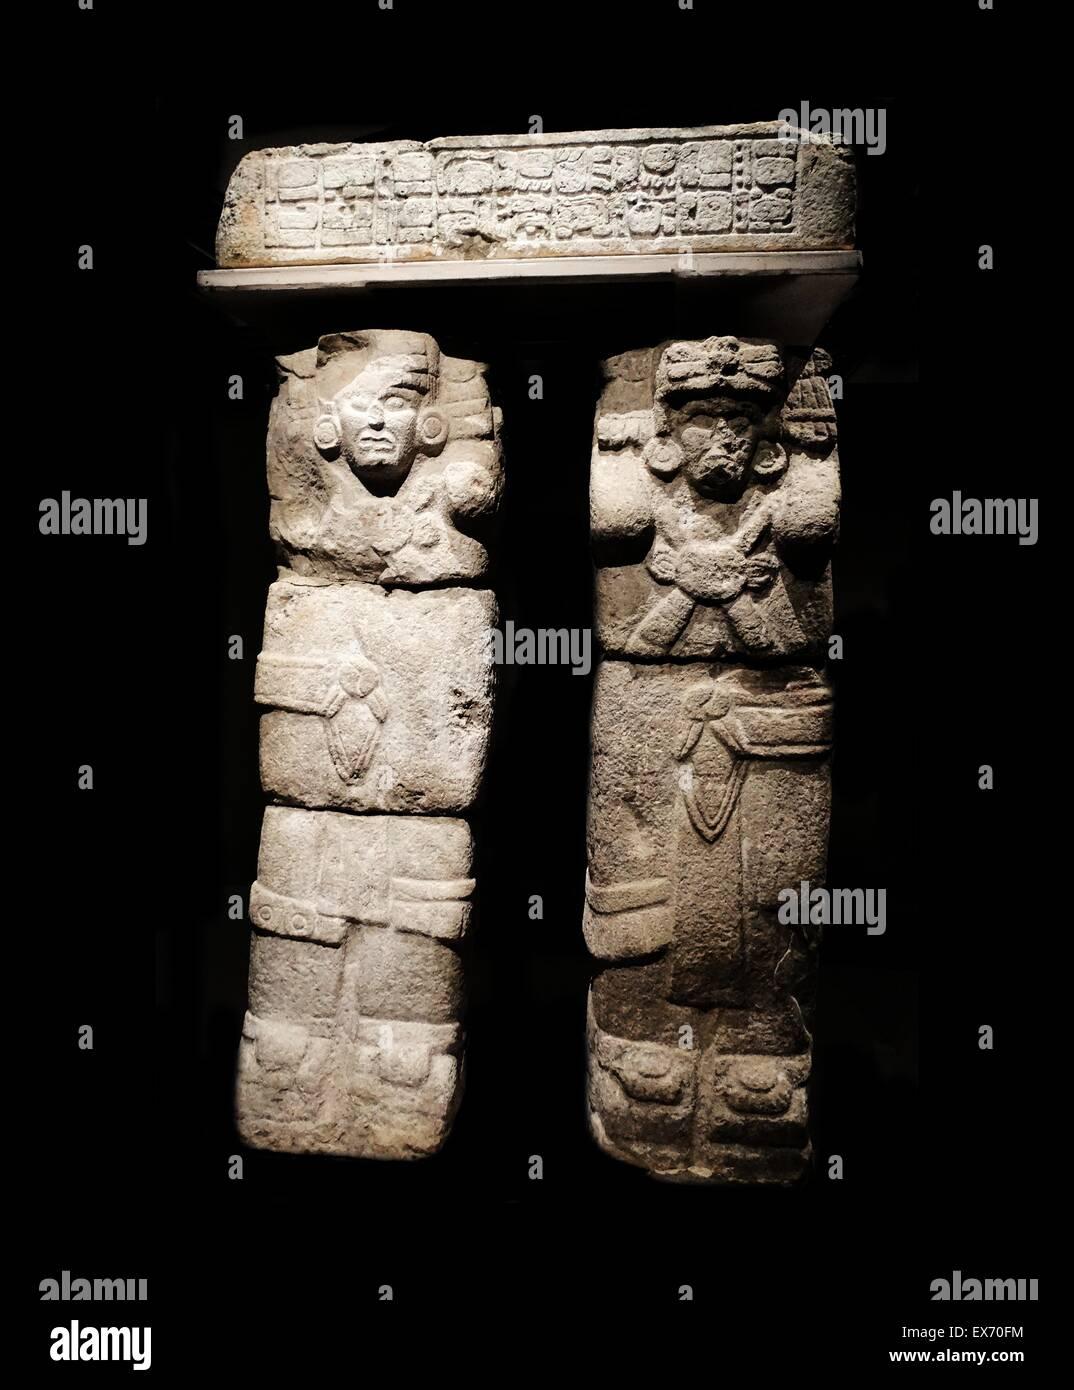 Mayan Atlante (Caryatid figure) from Chichen Itza, limestone, ancient post-classic era (900 - 1250 CE), - Stock Image